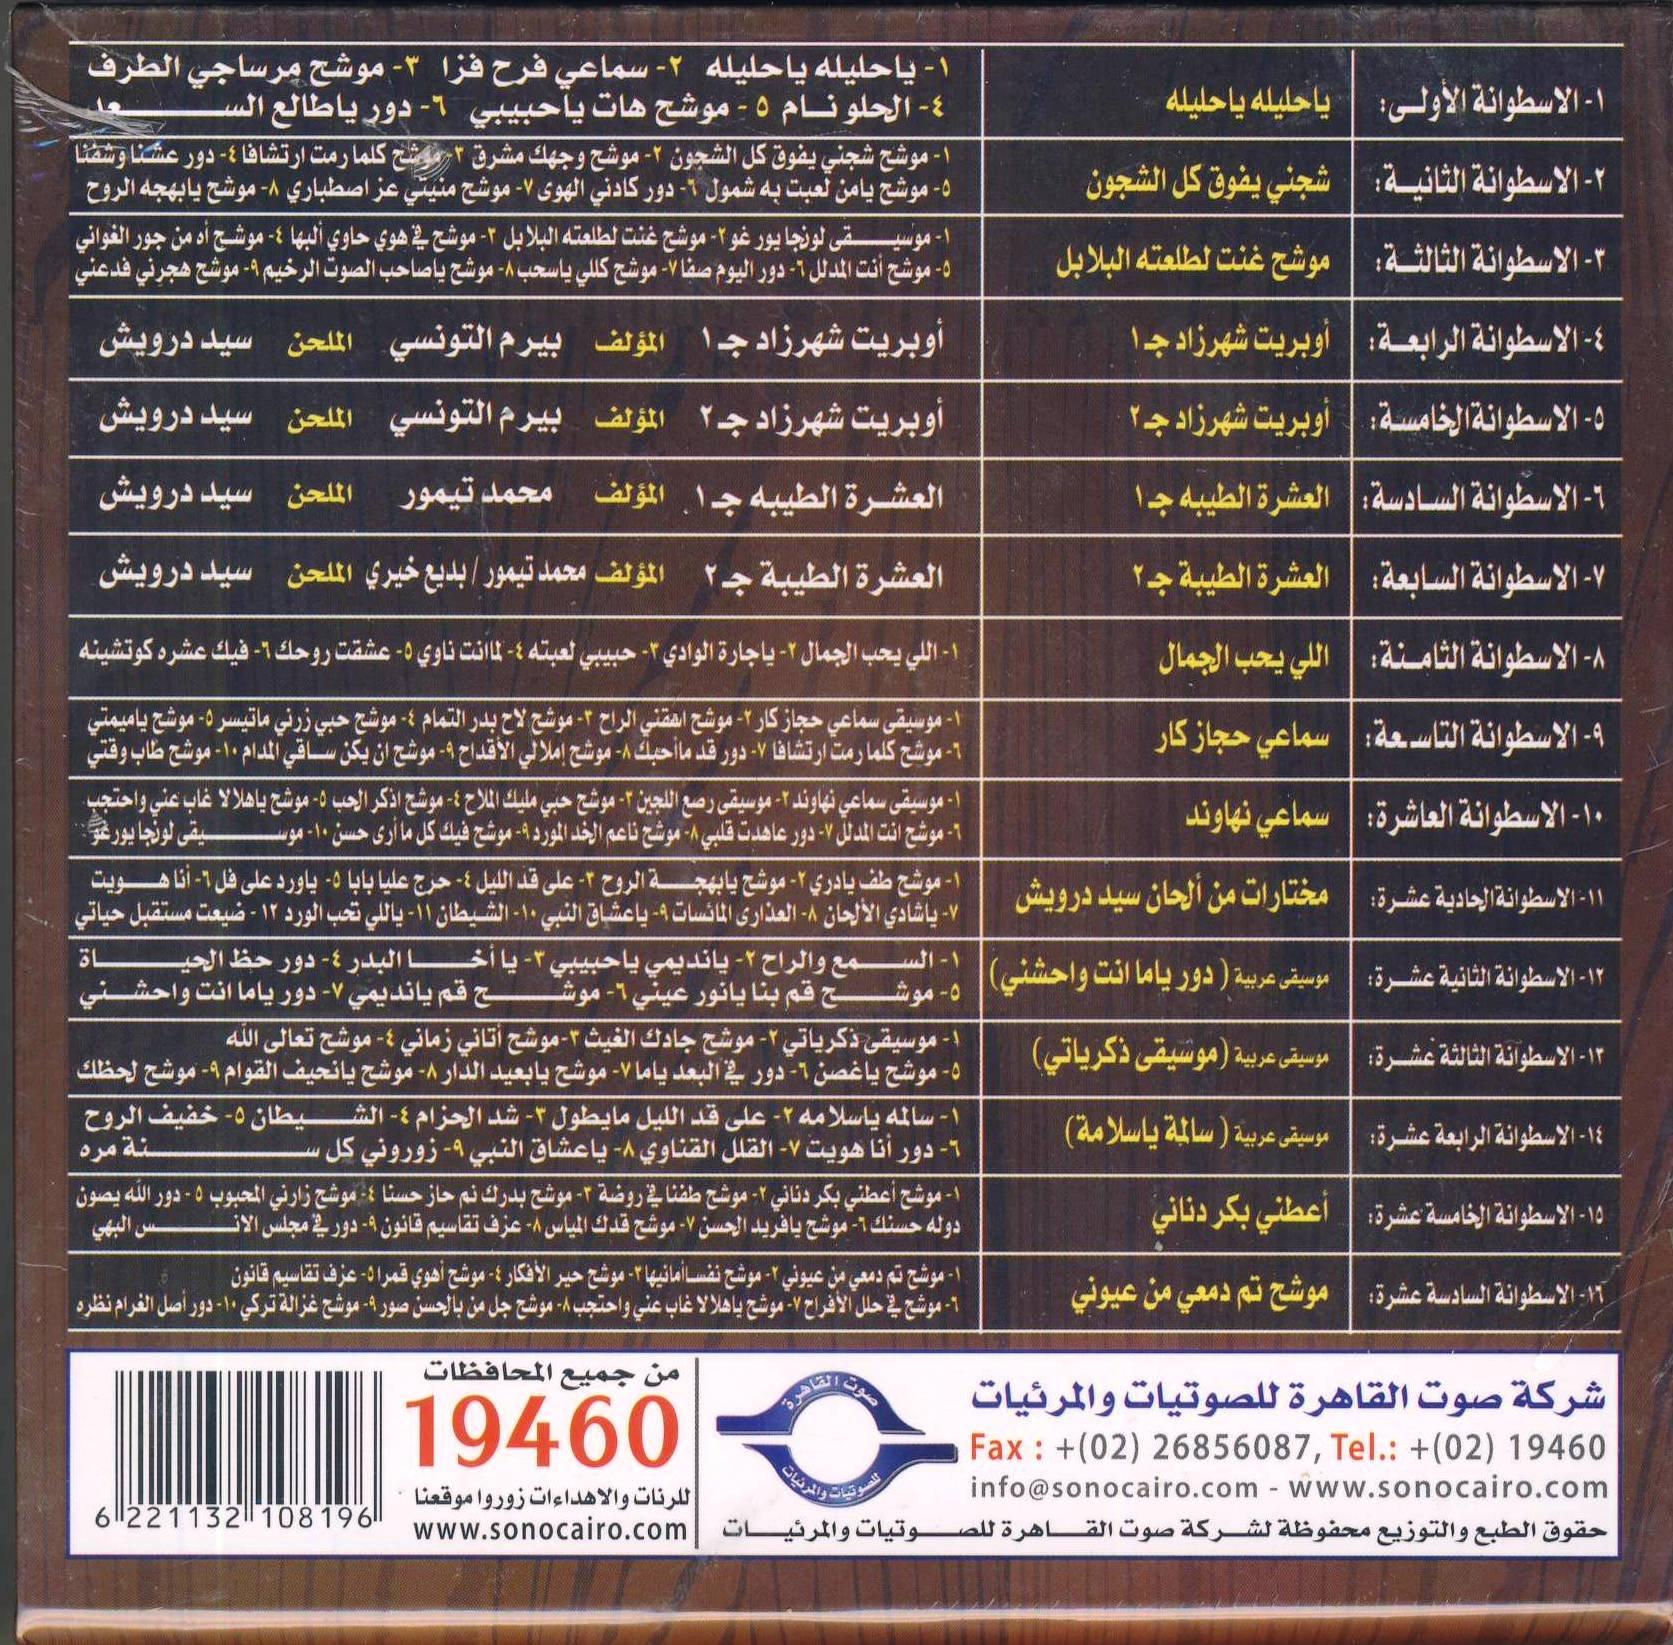 Sono Cairo Treasures Vol.1 - Best of Arabic Music by MBI (Image #2)